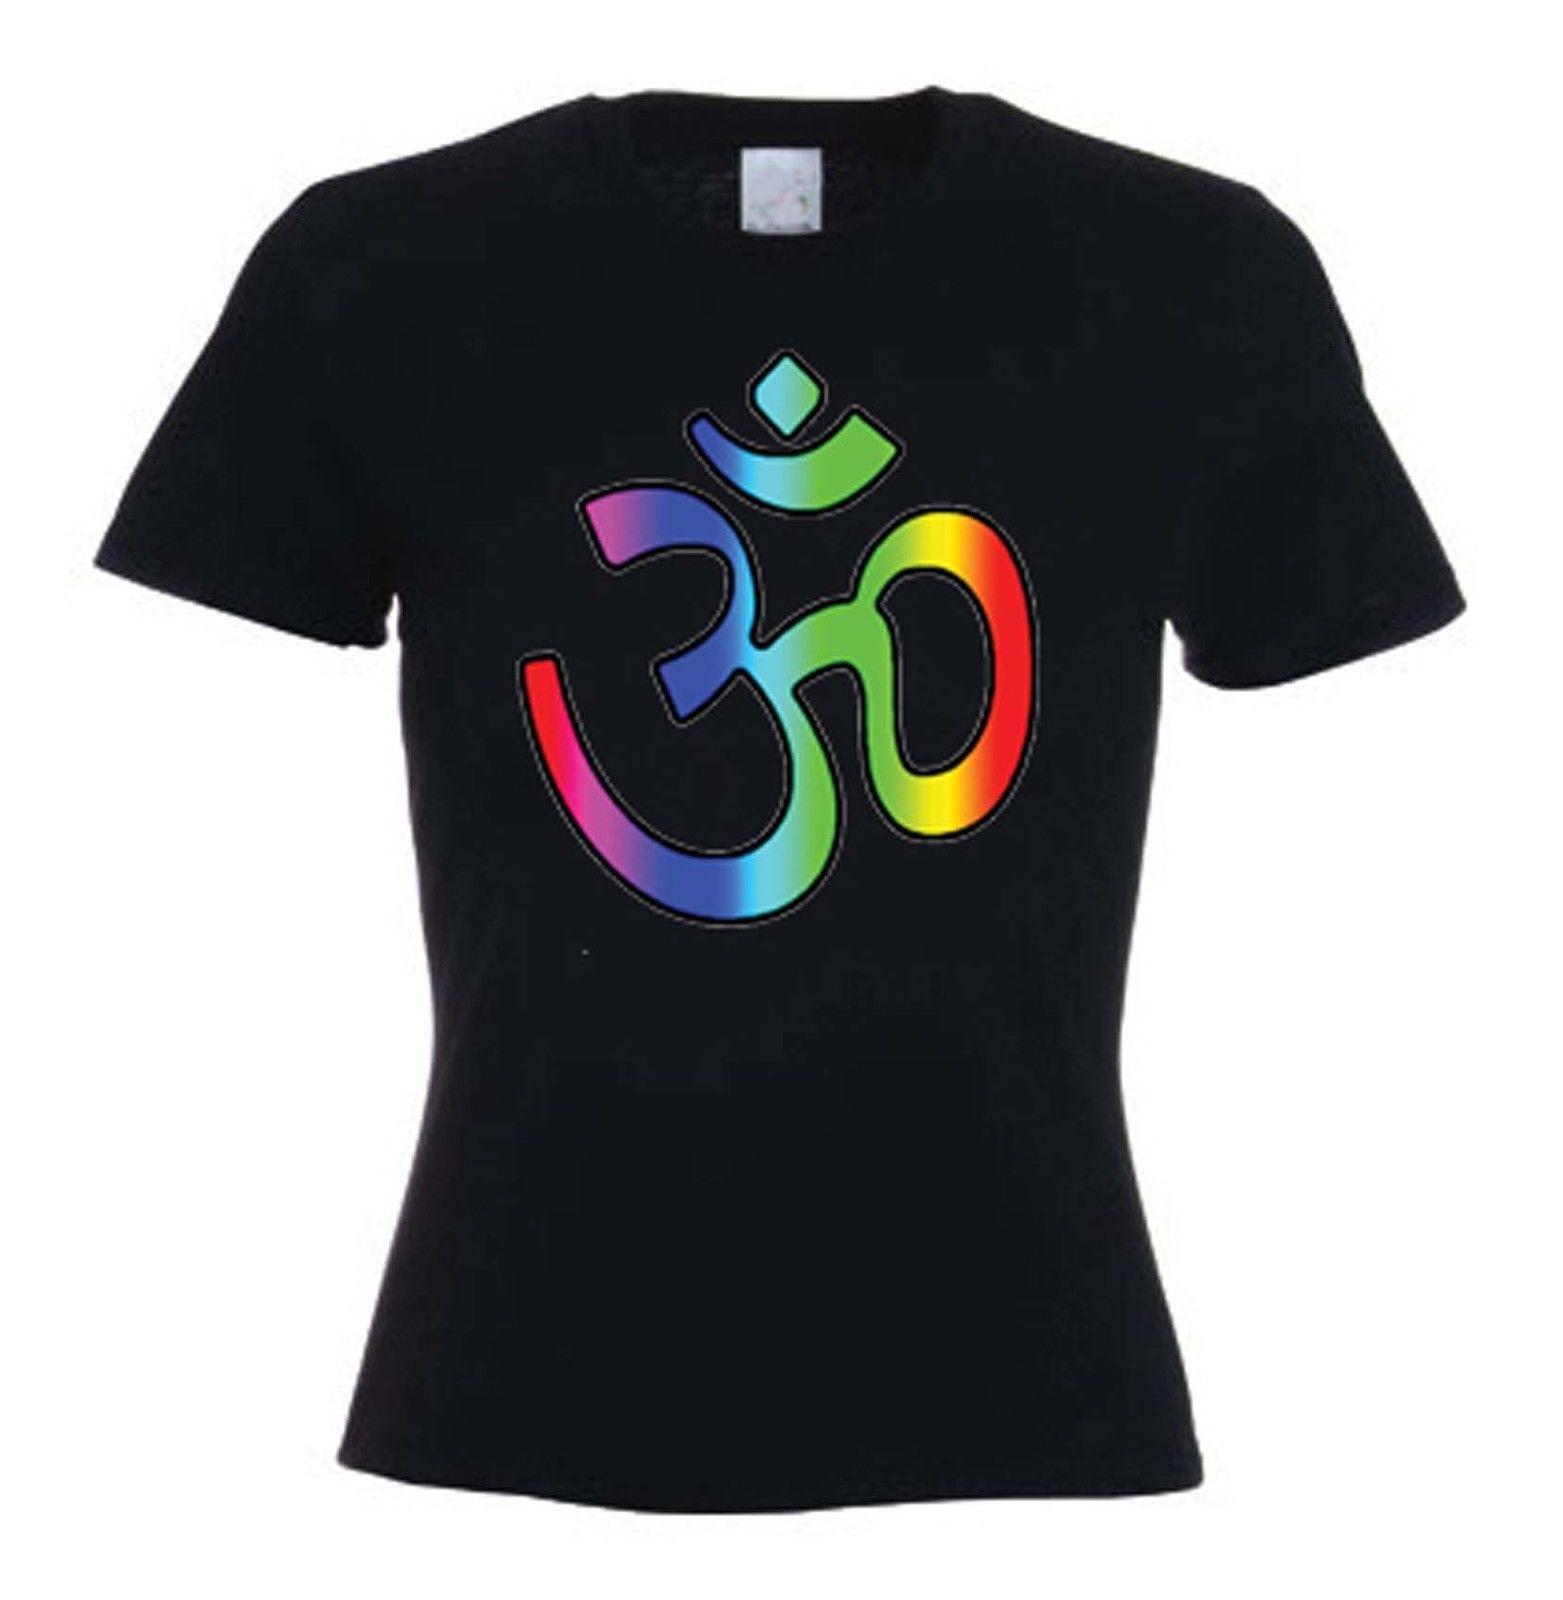 203ef841e OM SYMBOL WOMEN'S T-SHIRT - Hindu Yoga Meditation Aum Hinduism -Choice Of  Colour